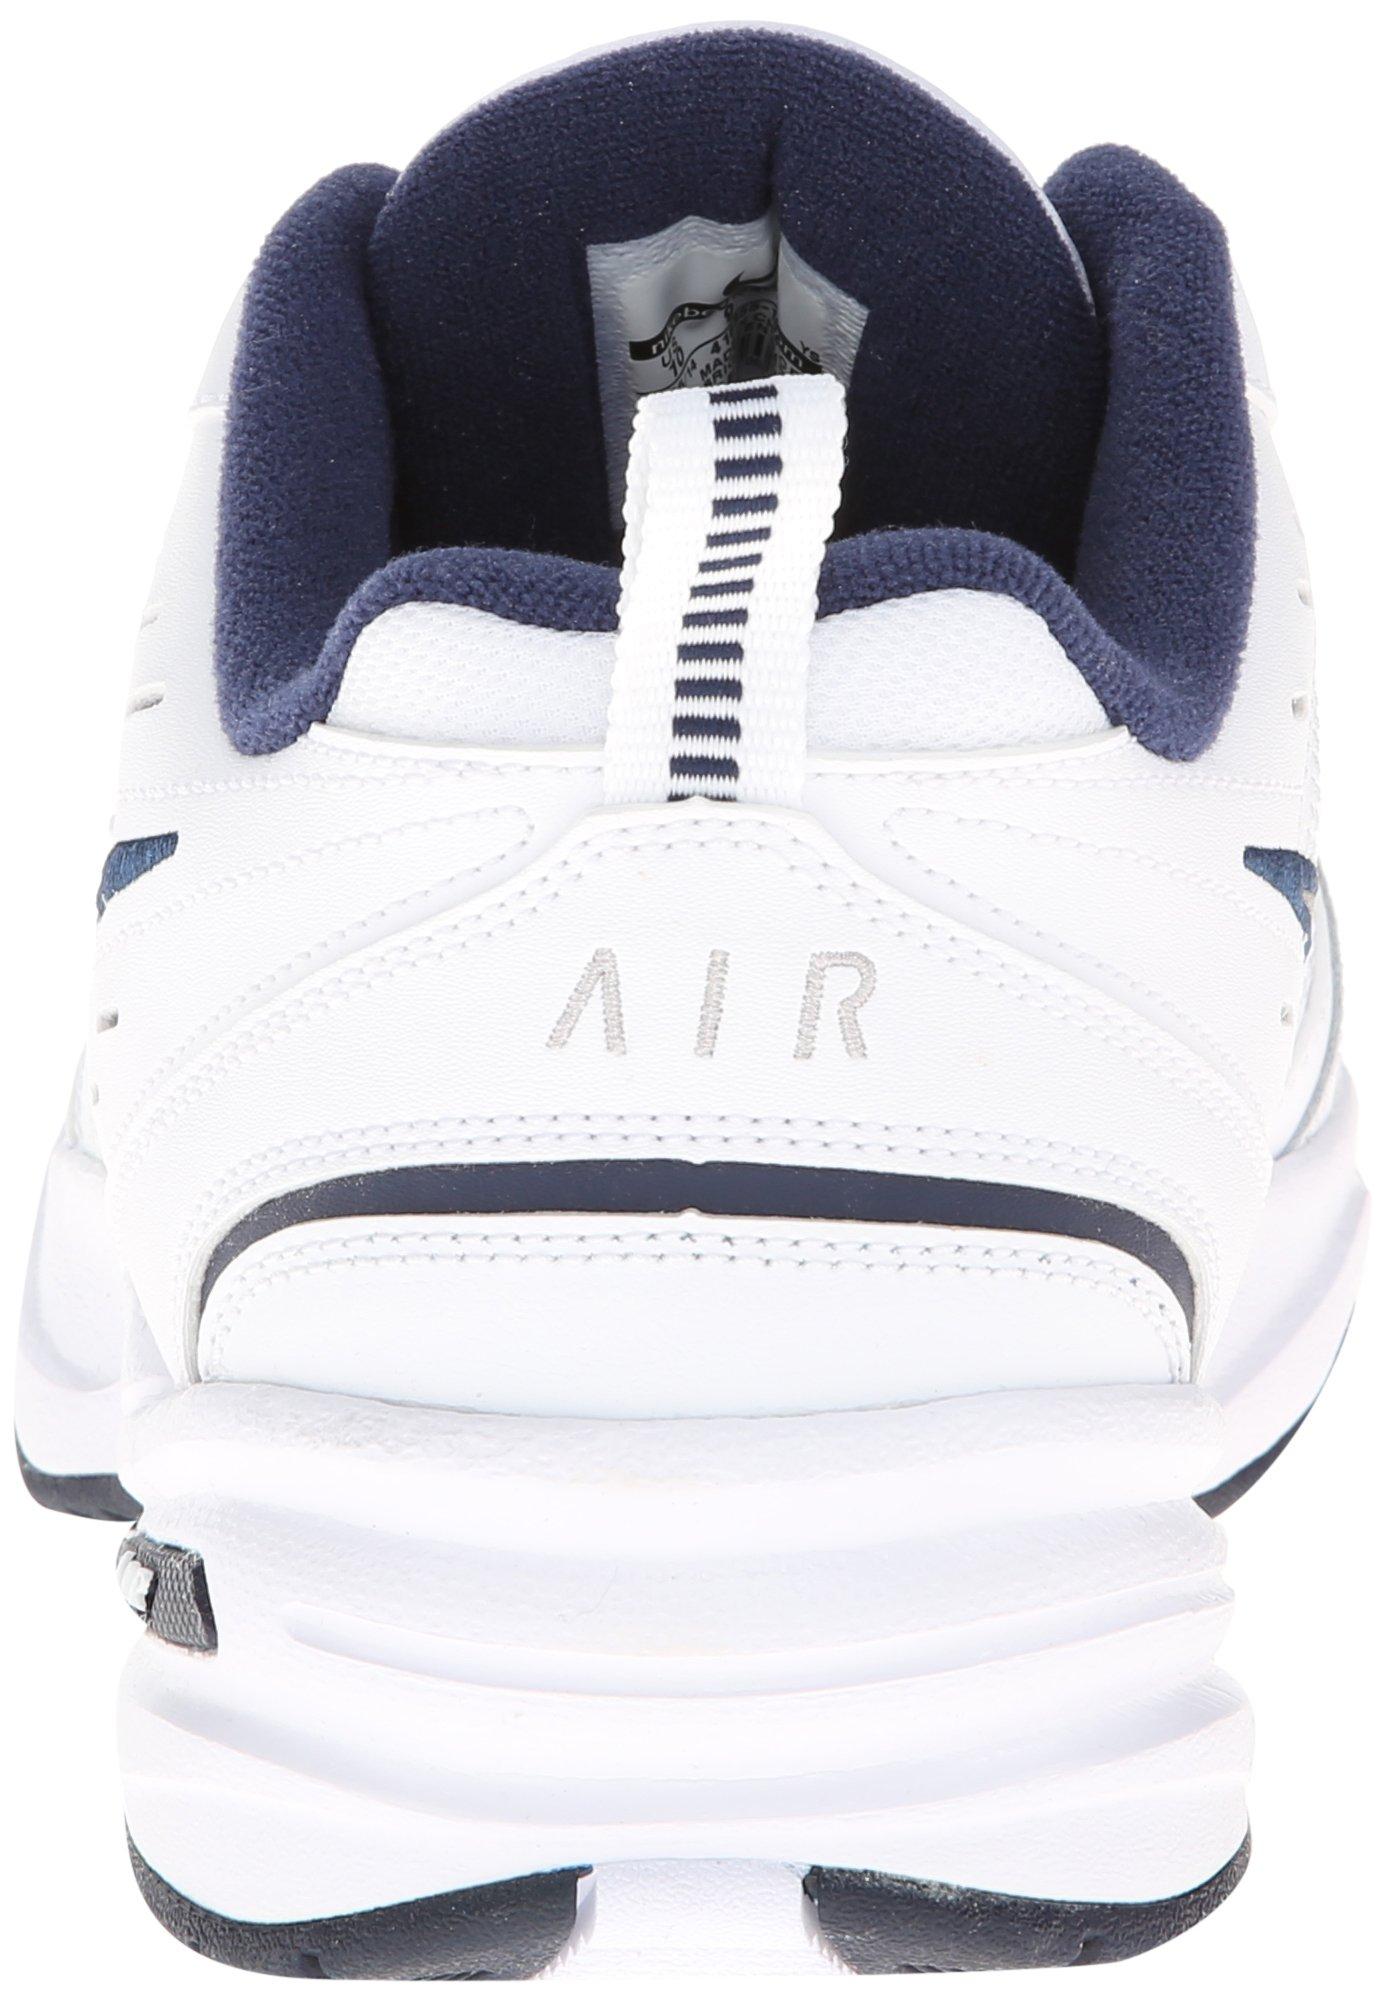 Nike-Men-039-s-Air-Monarch-IV-Cross-Trainer-Sneaker-416355 thumbnail 19